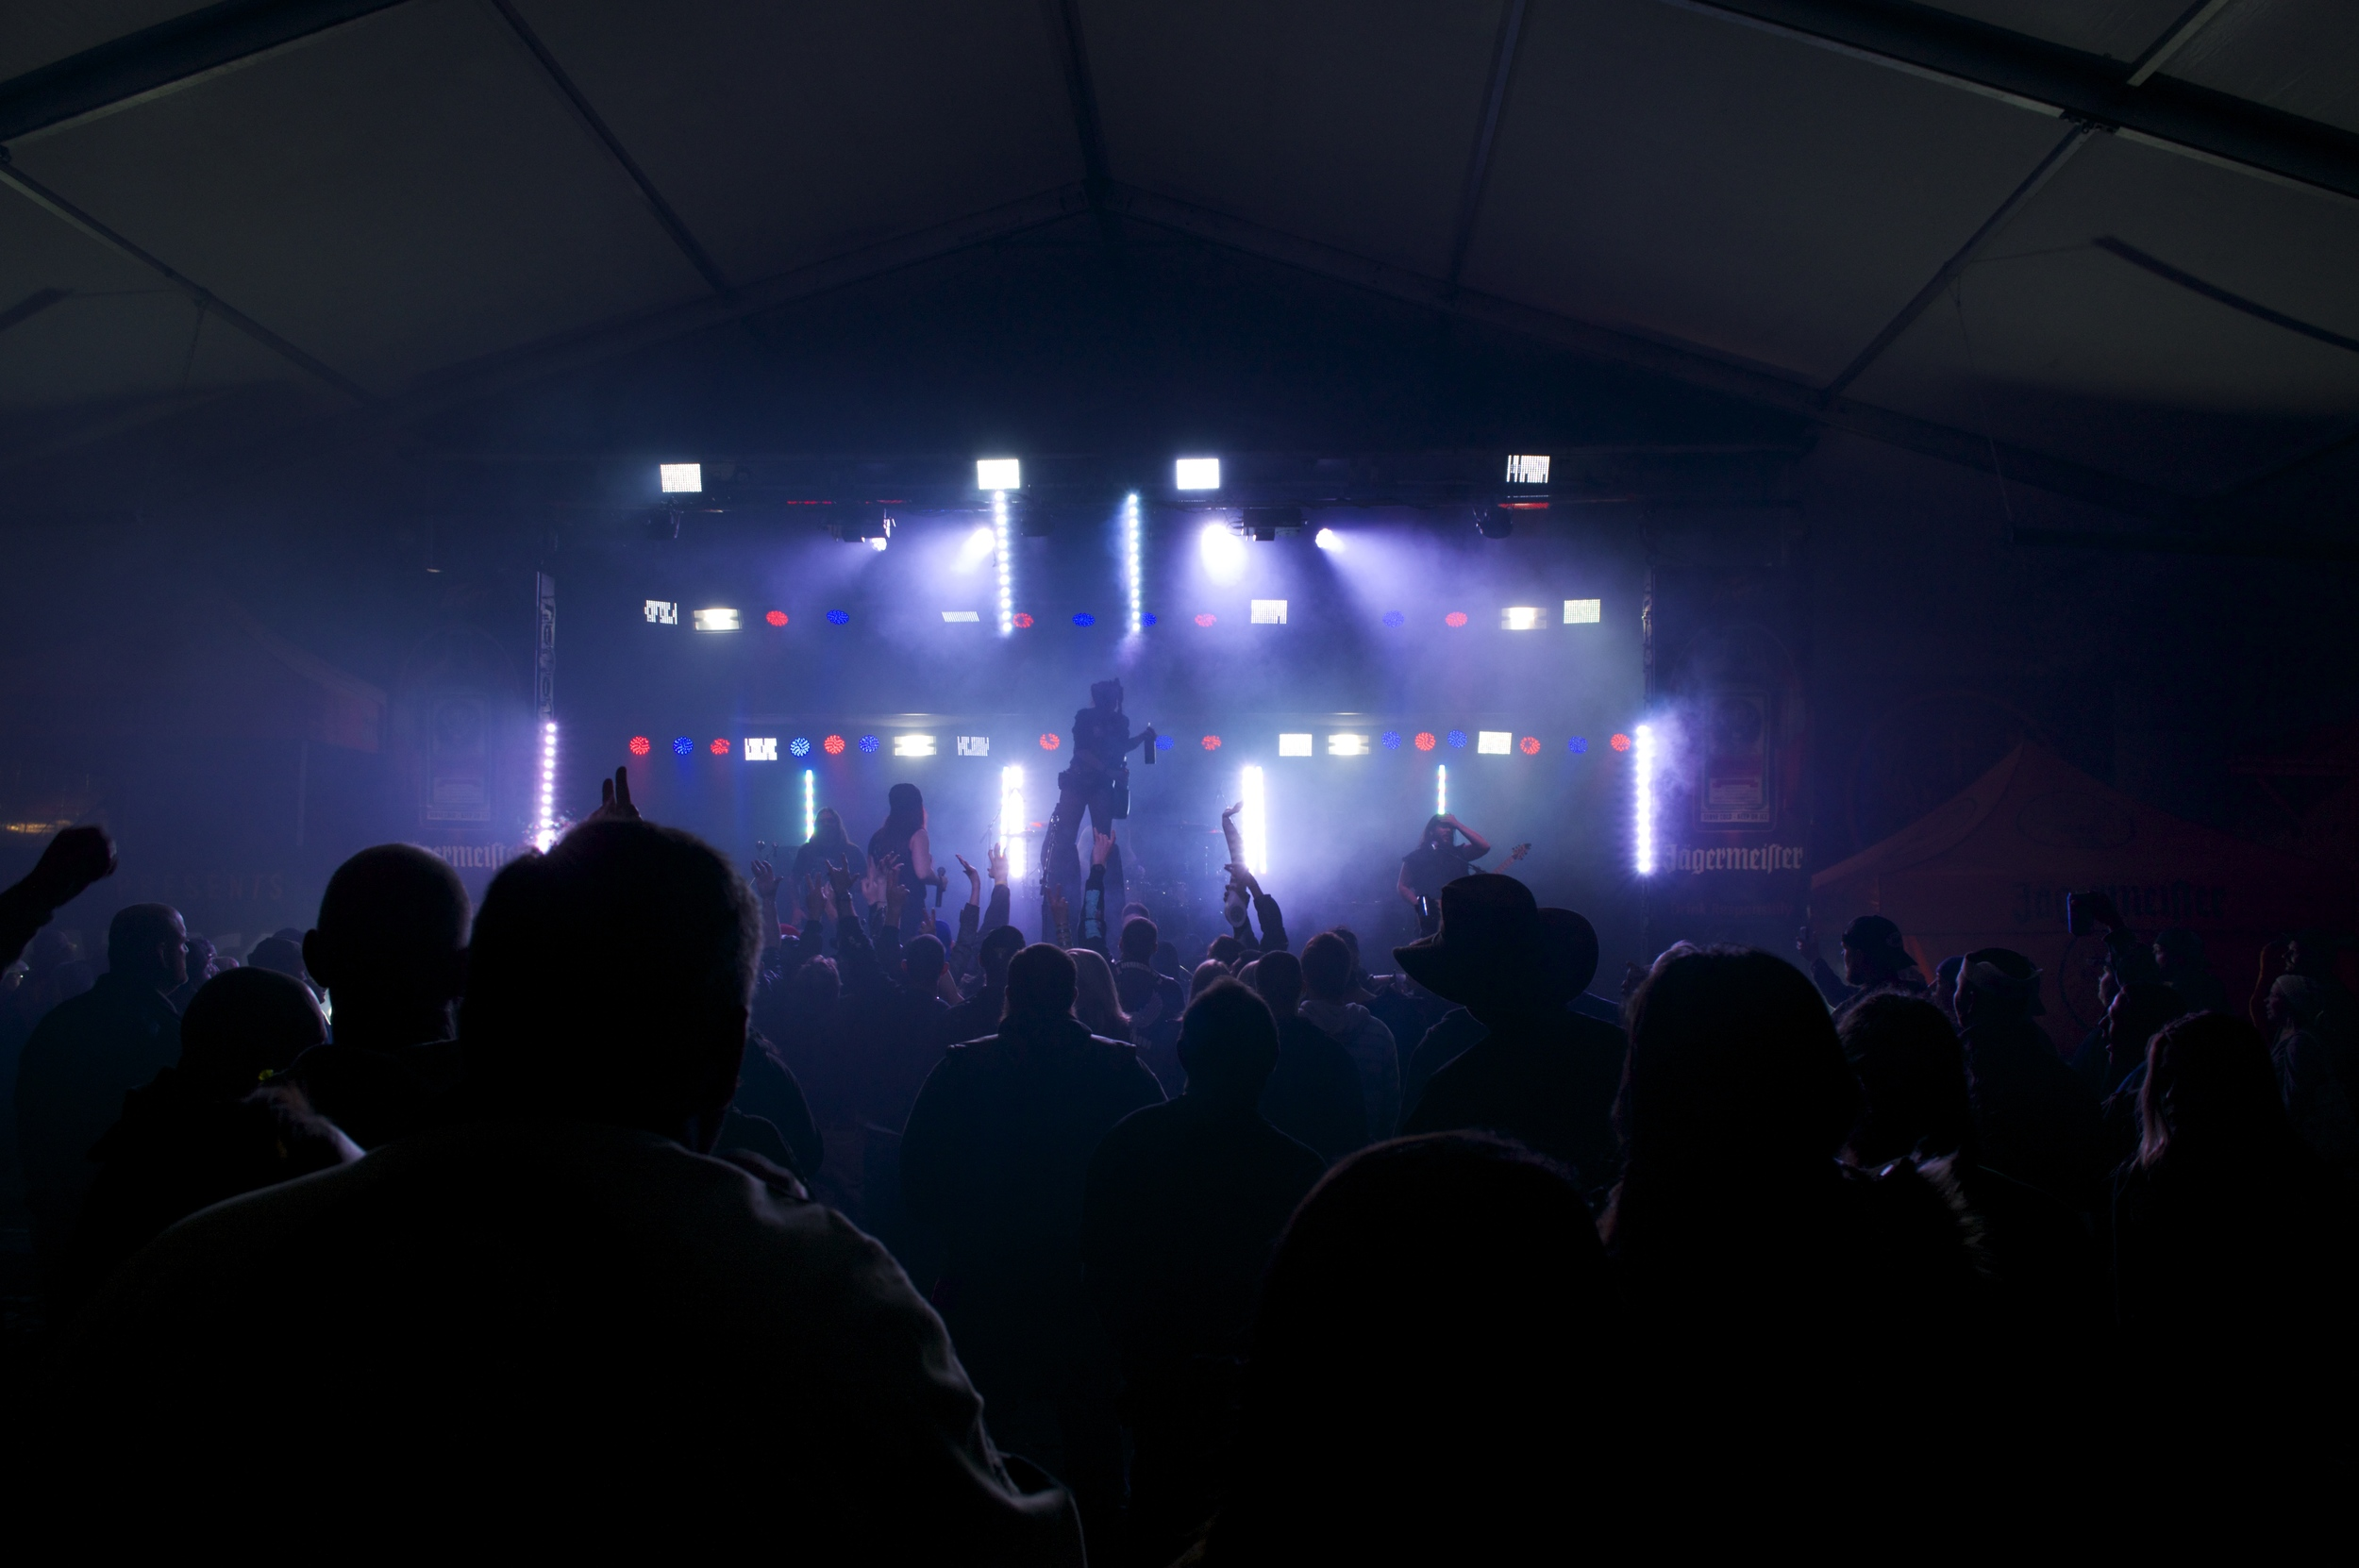 Concert Lighting Patrick J Brodnicki Lighting Design And Programing